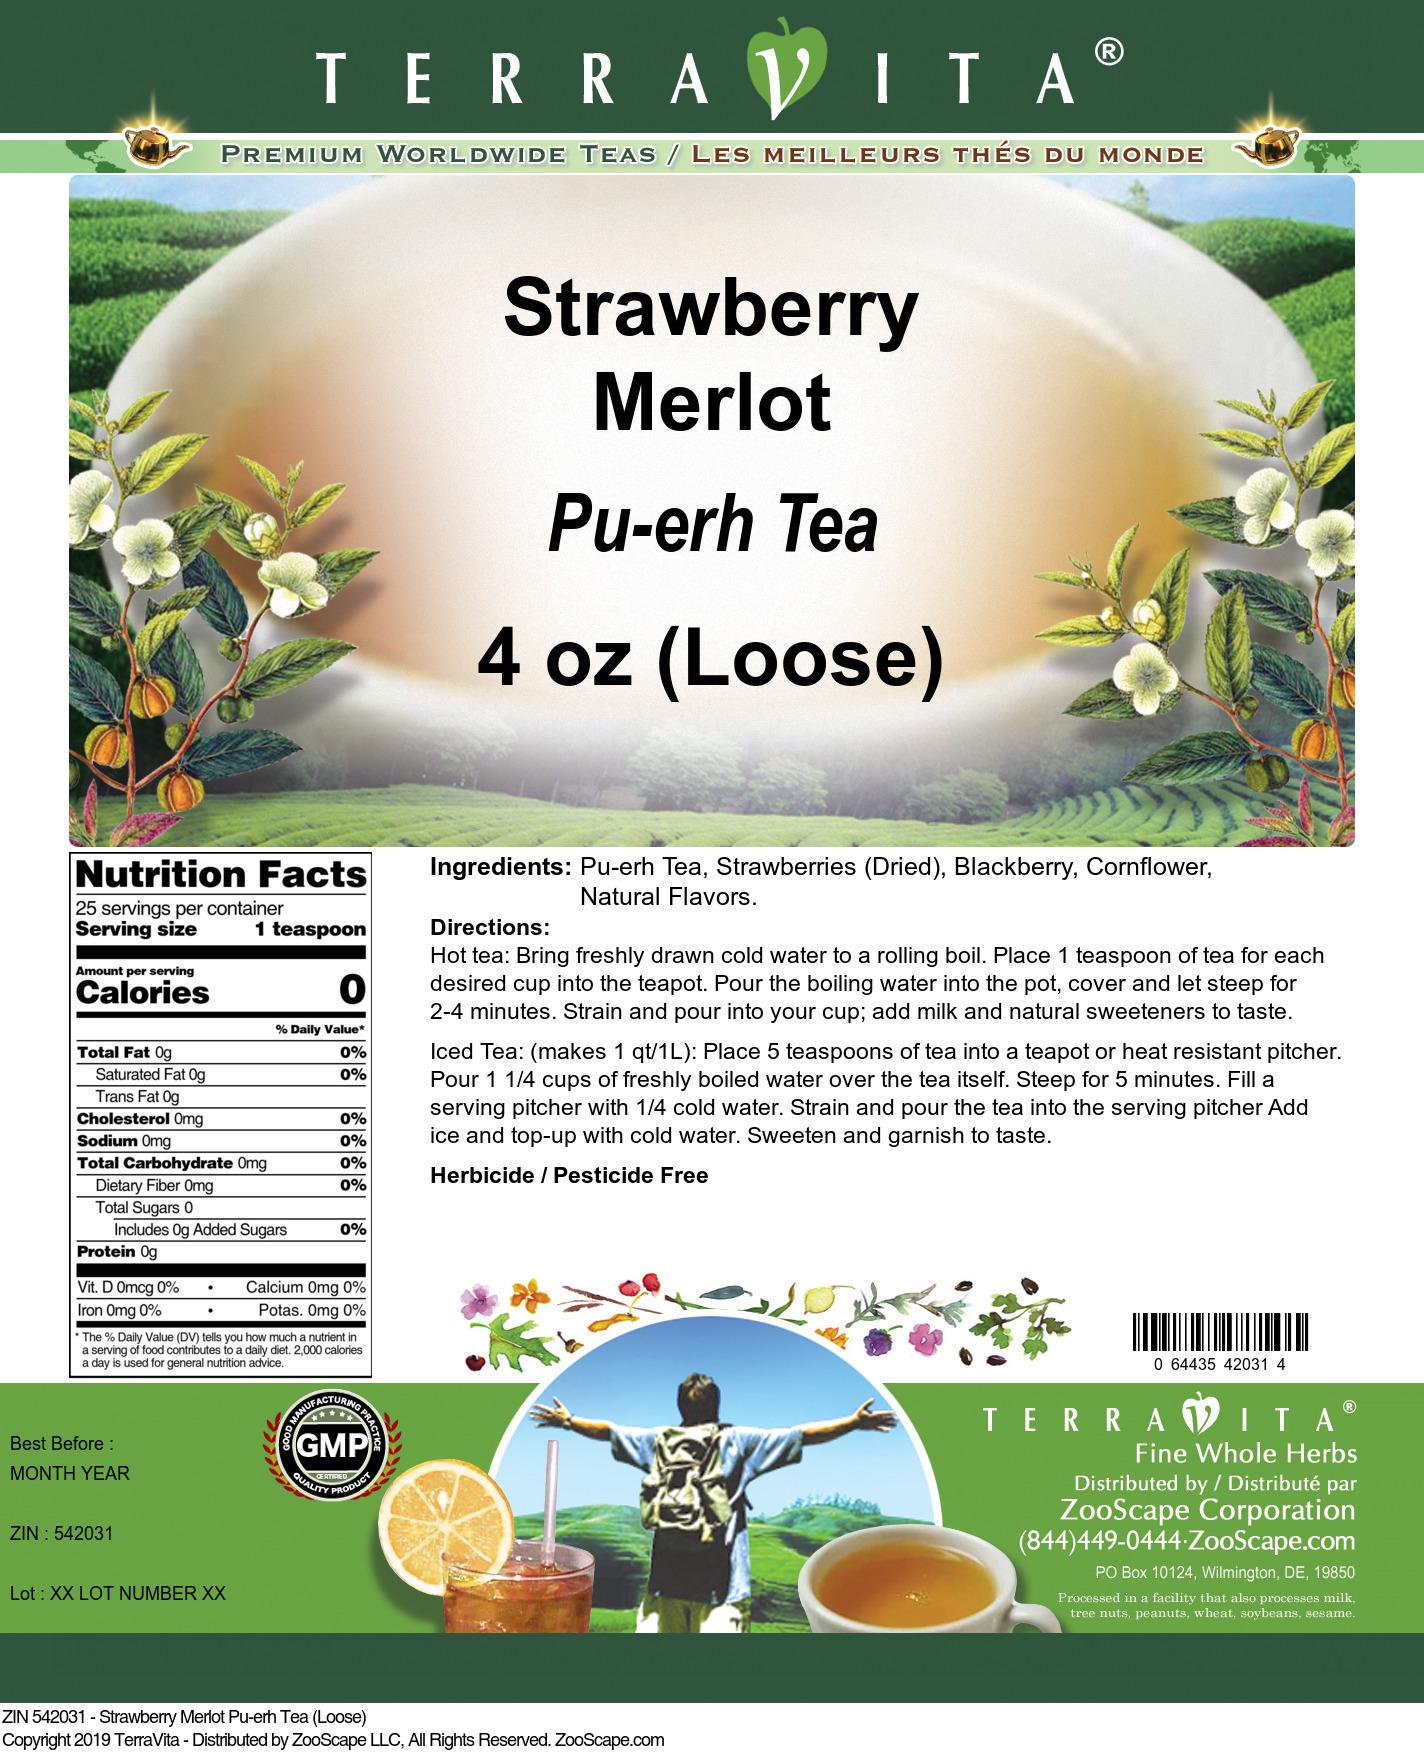 Strawberry Merlot Pu-erh Tea (Loose)